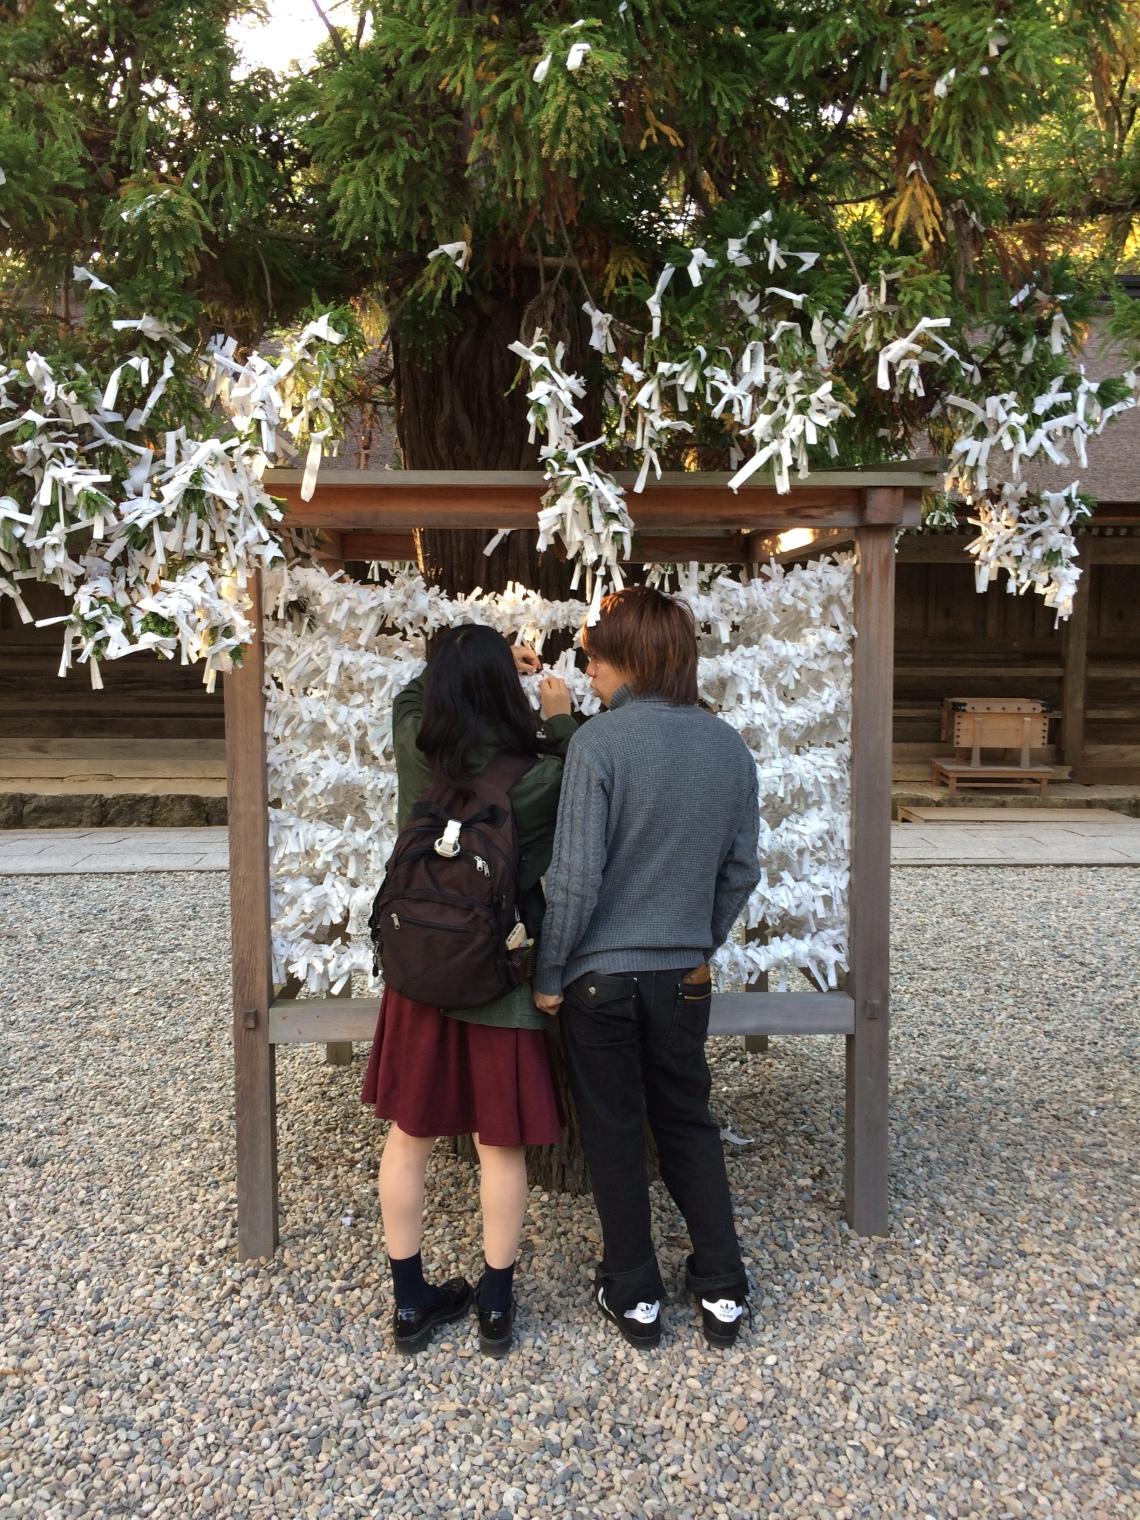 Fortune Tree Izumo Shrine 2